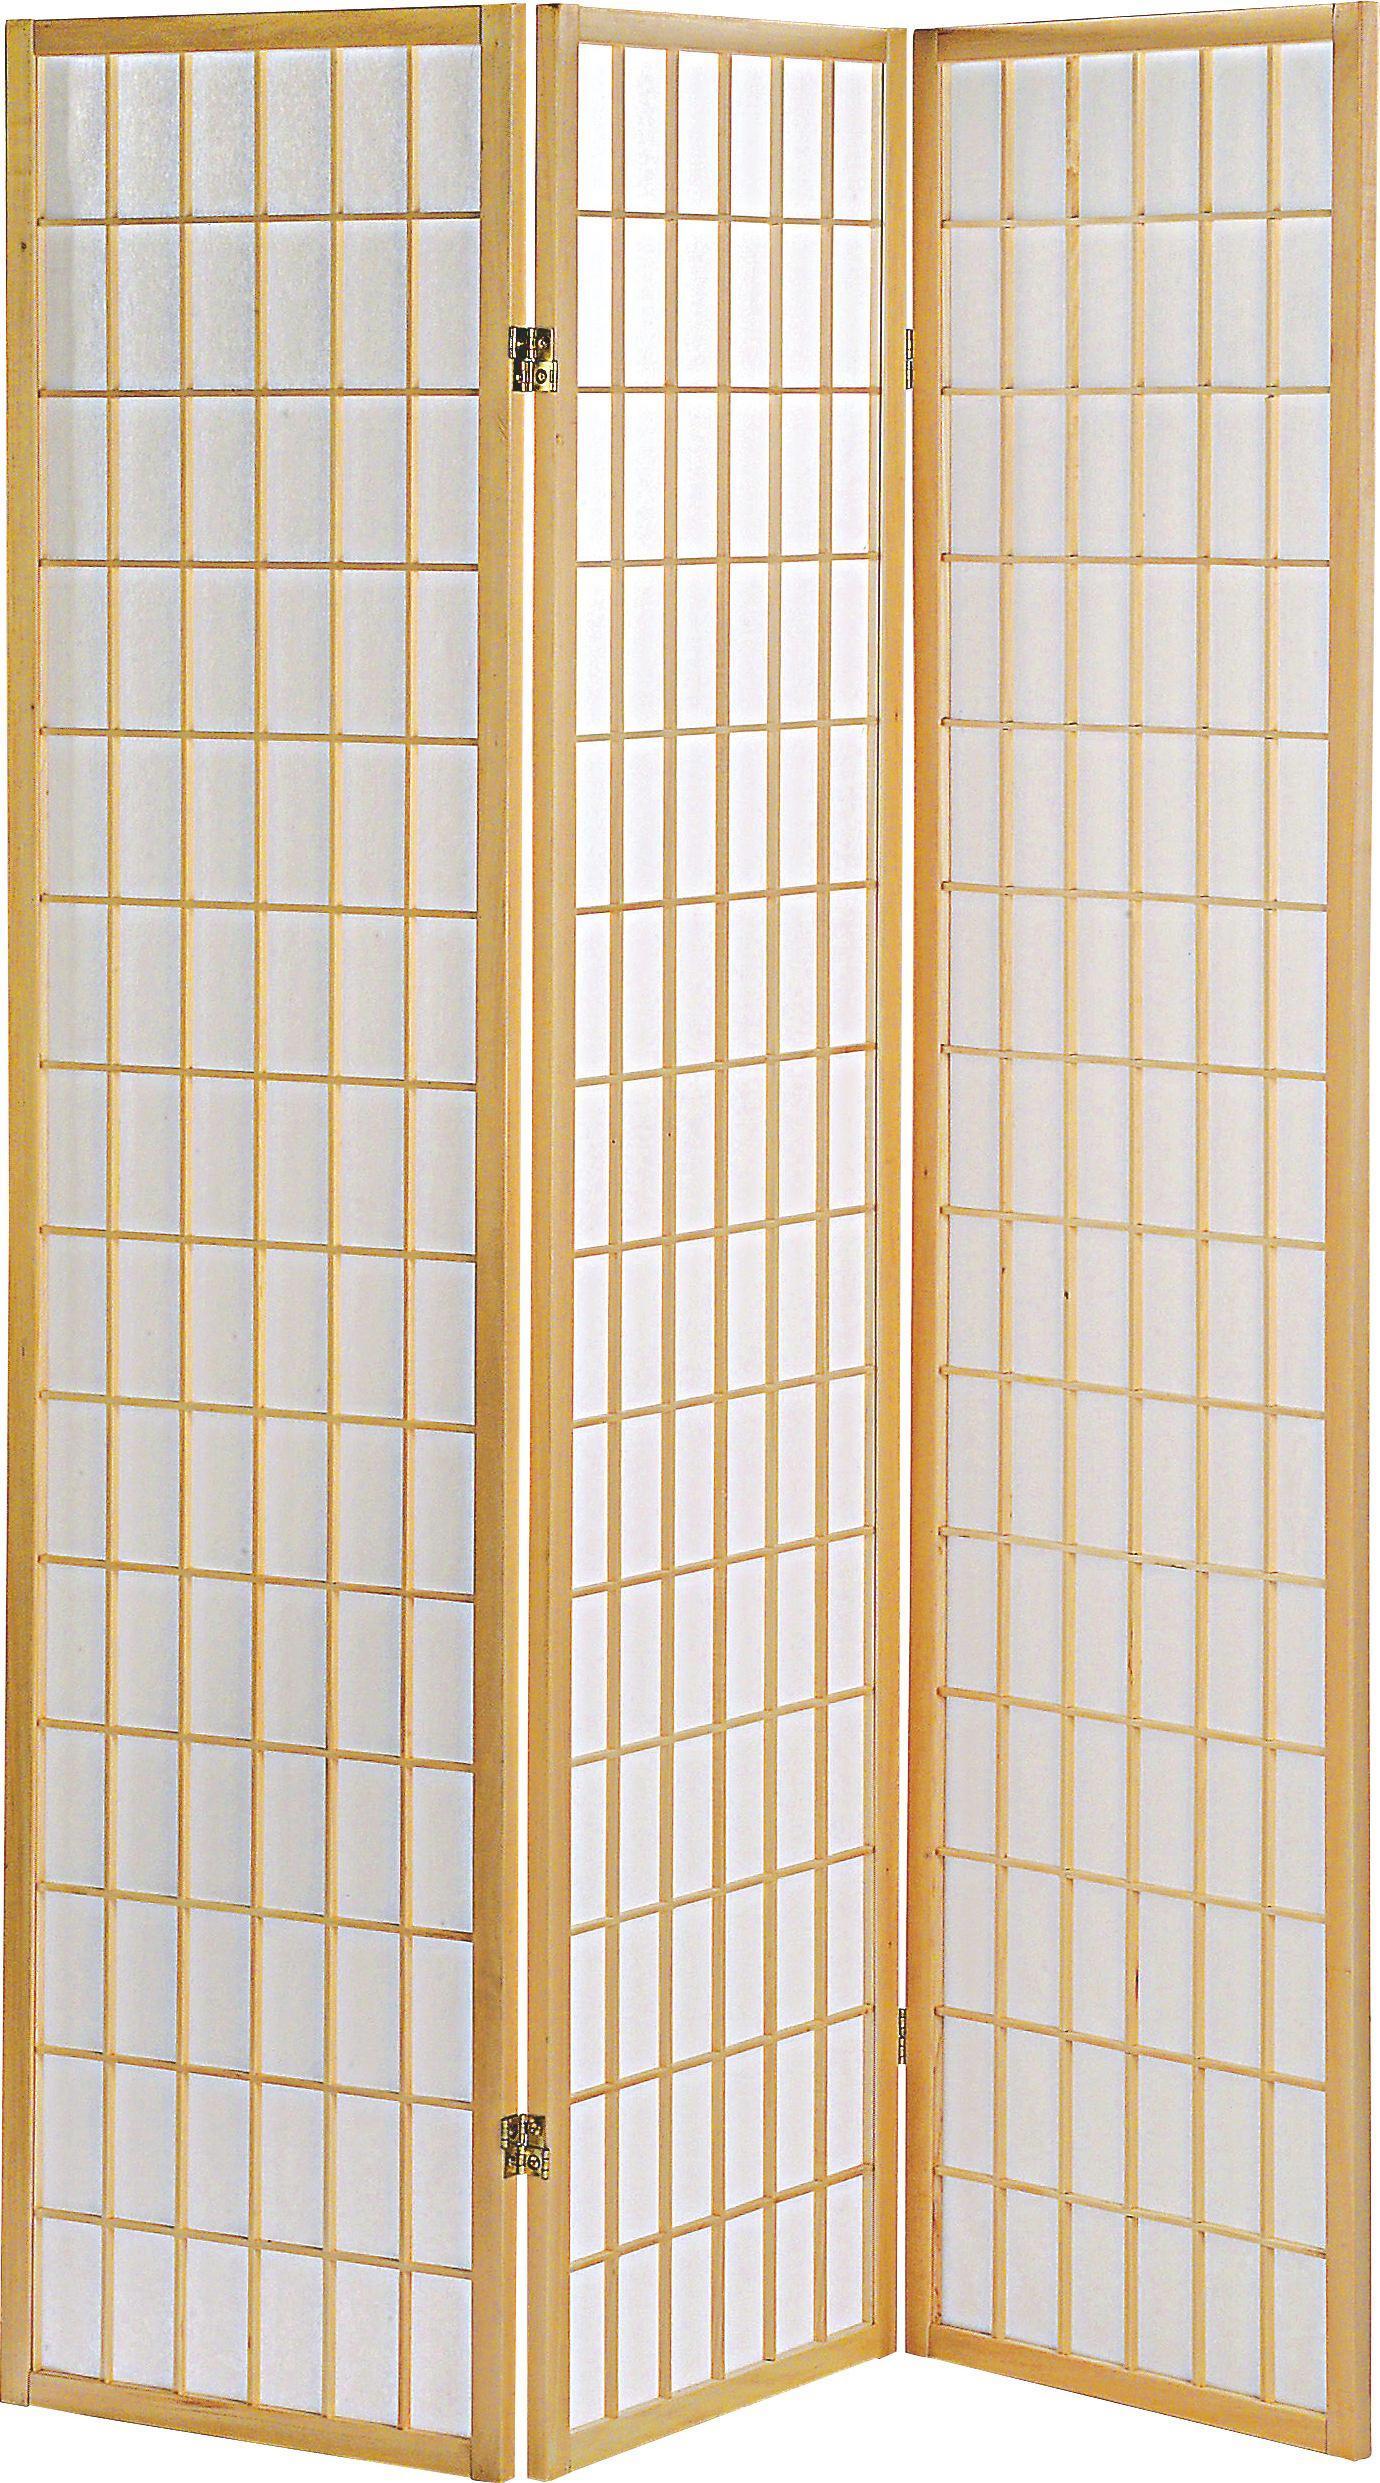 Paravent Naomi - Naturfarben, Holz/Papier (131/179/2cm) - MÖMAX modern living